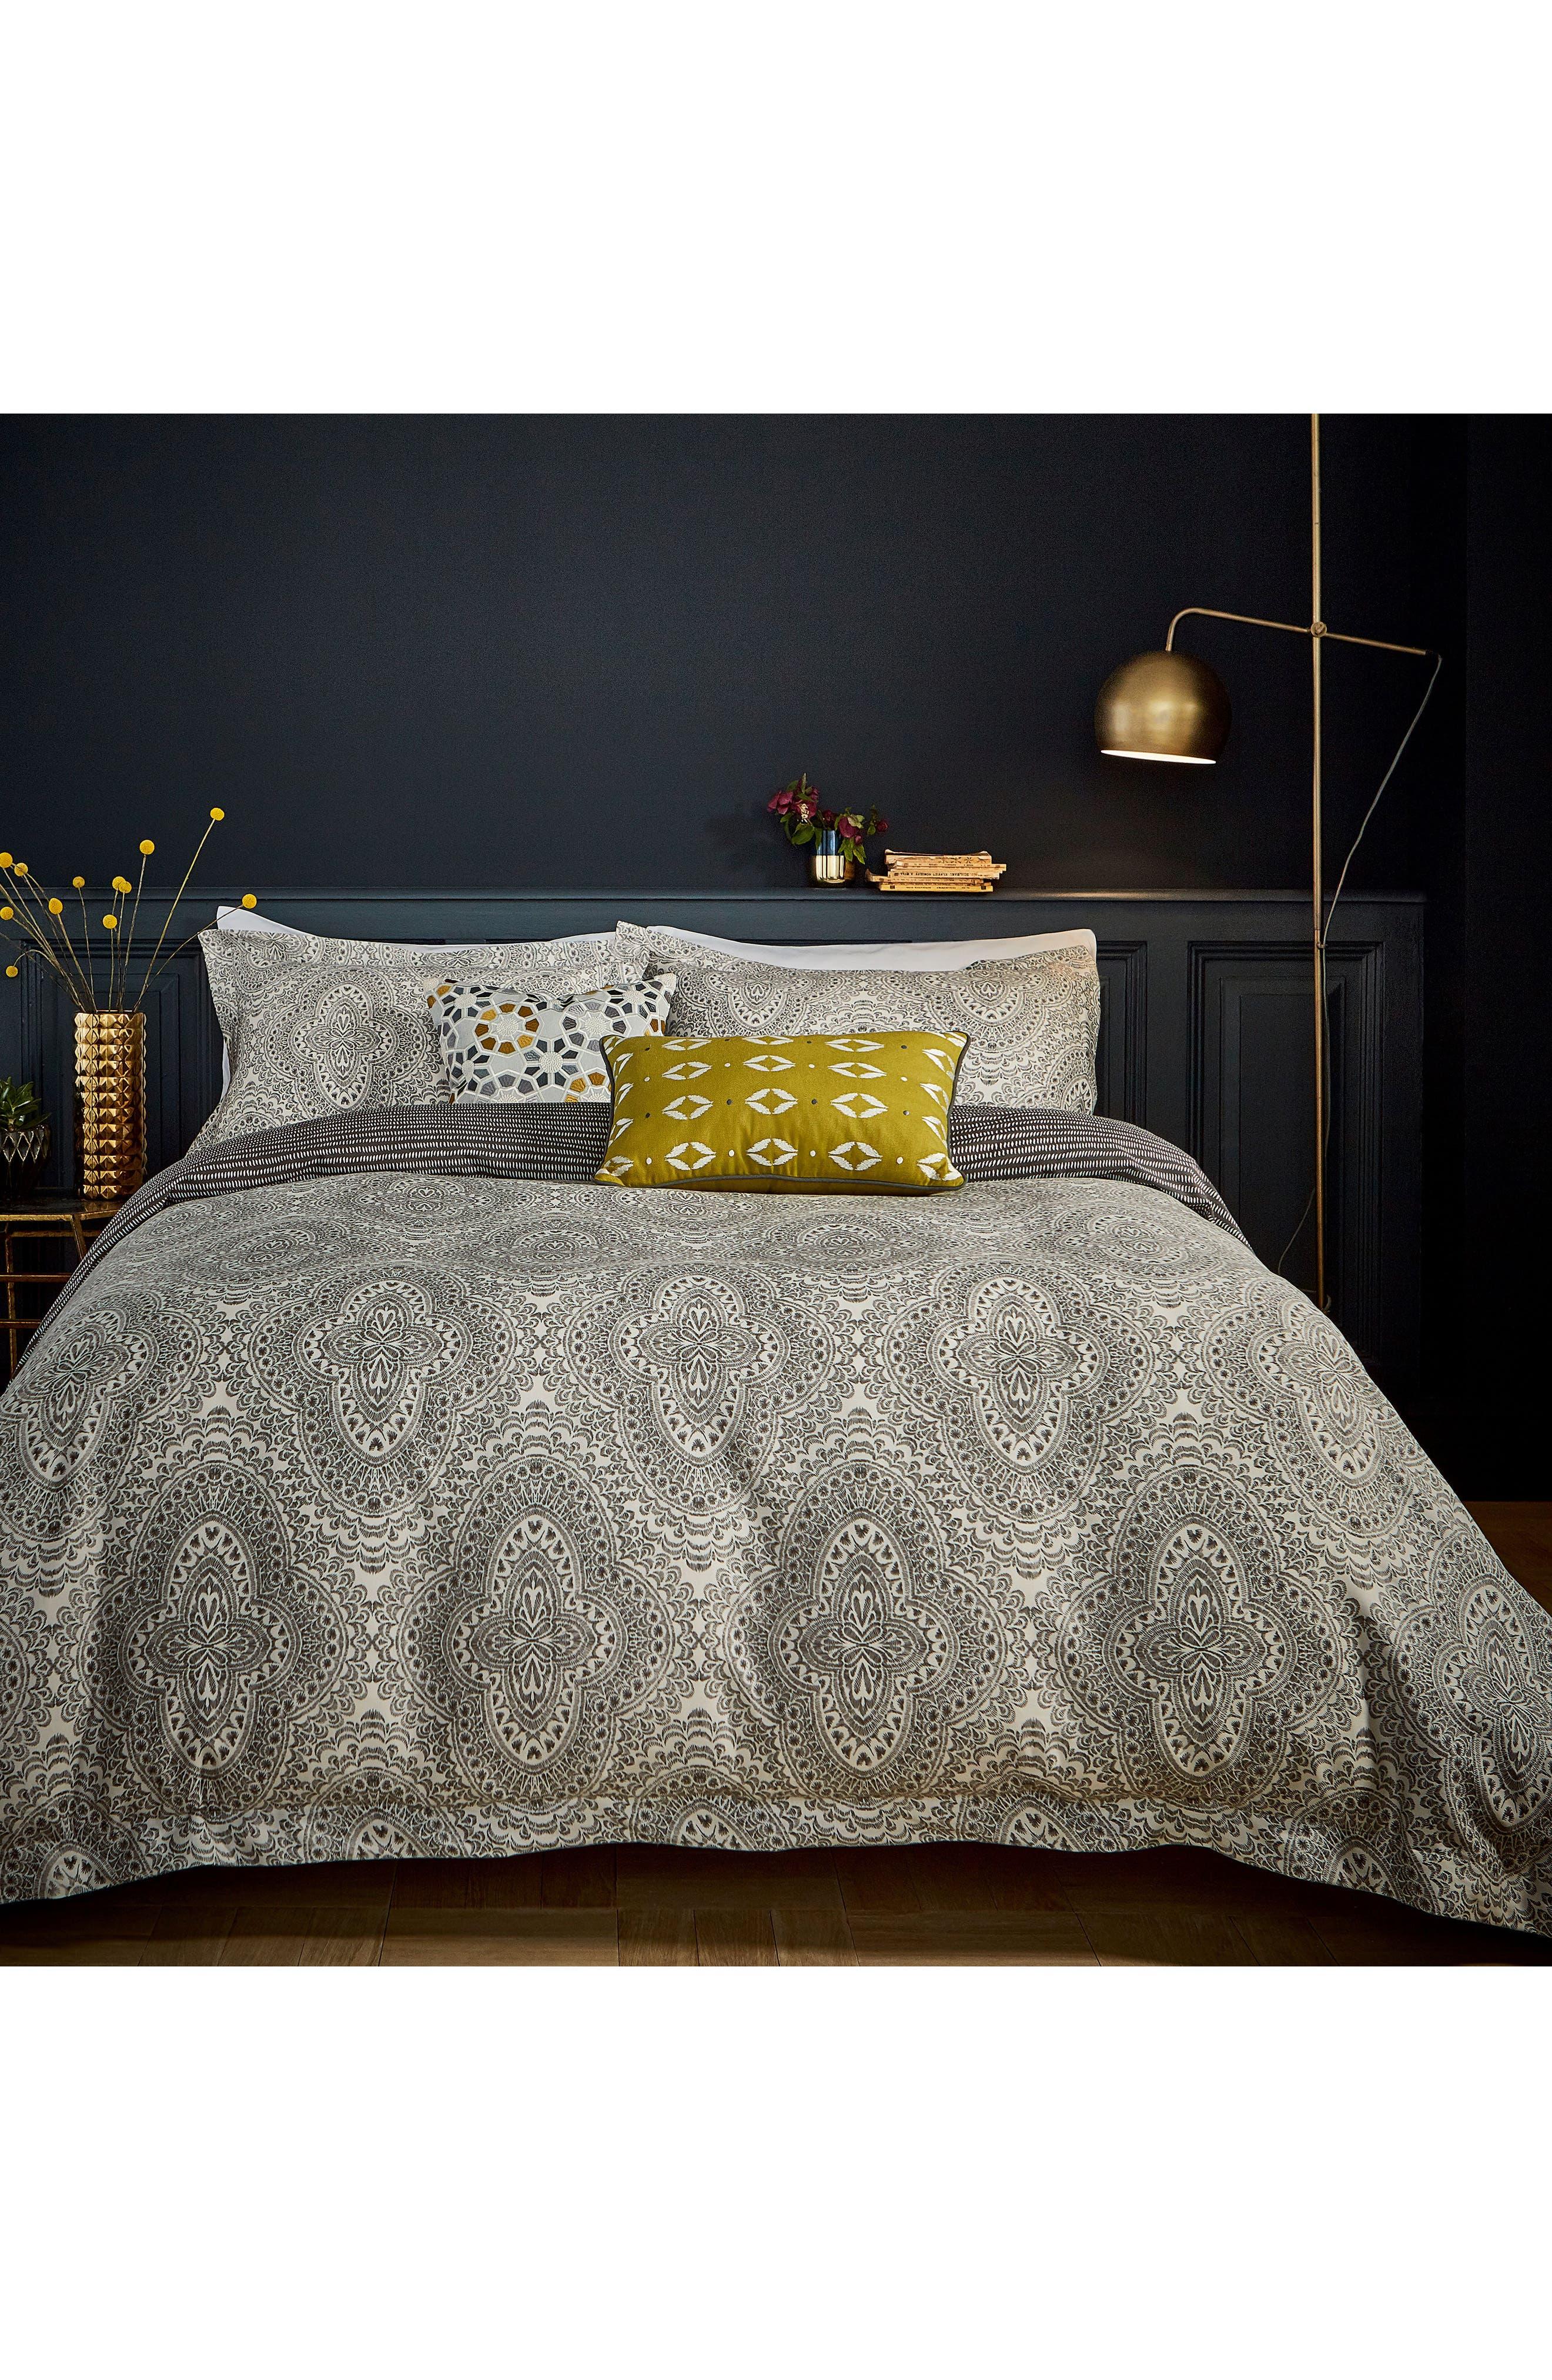 Ziba Duvet Cover, Sham & Accent Pillow Set,                             Main thumbnail 1, color,                             Grey